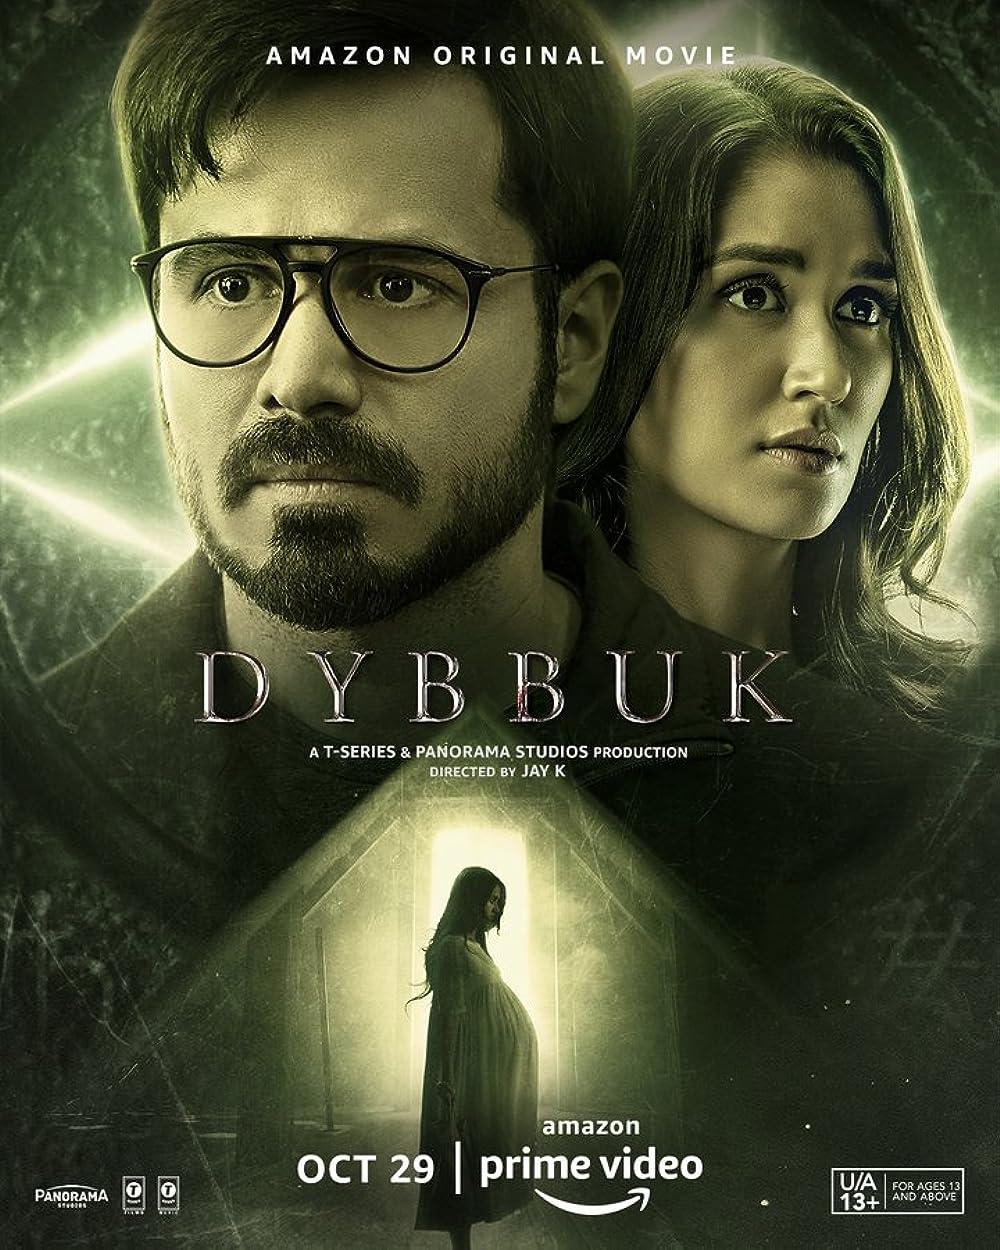 Download Dybbuk: The Curse Is Real (2021) Hindi Movie 1080p WEB_DL HDRip ESub 2.2GB